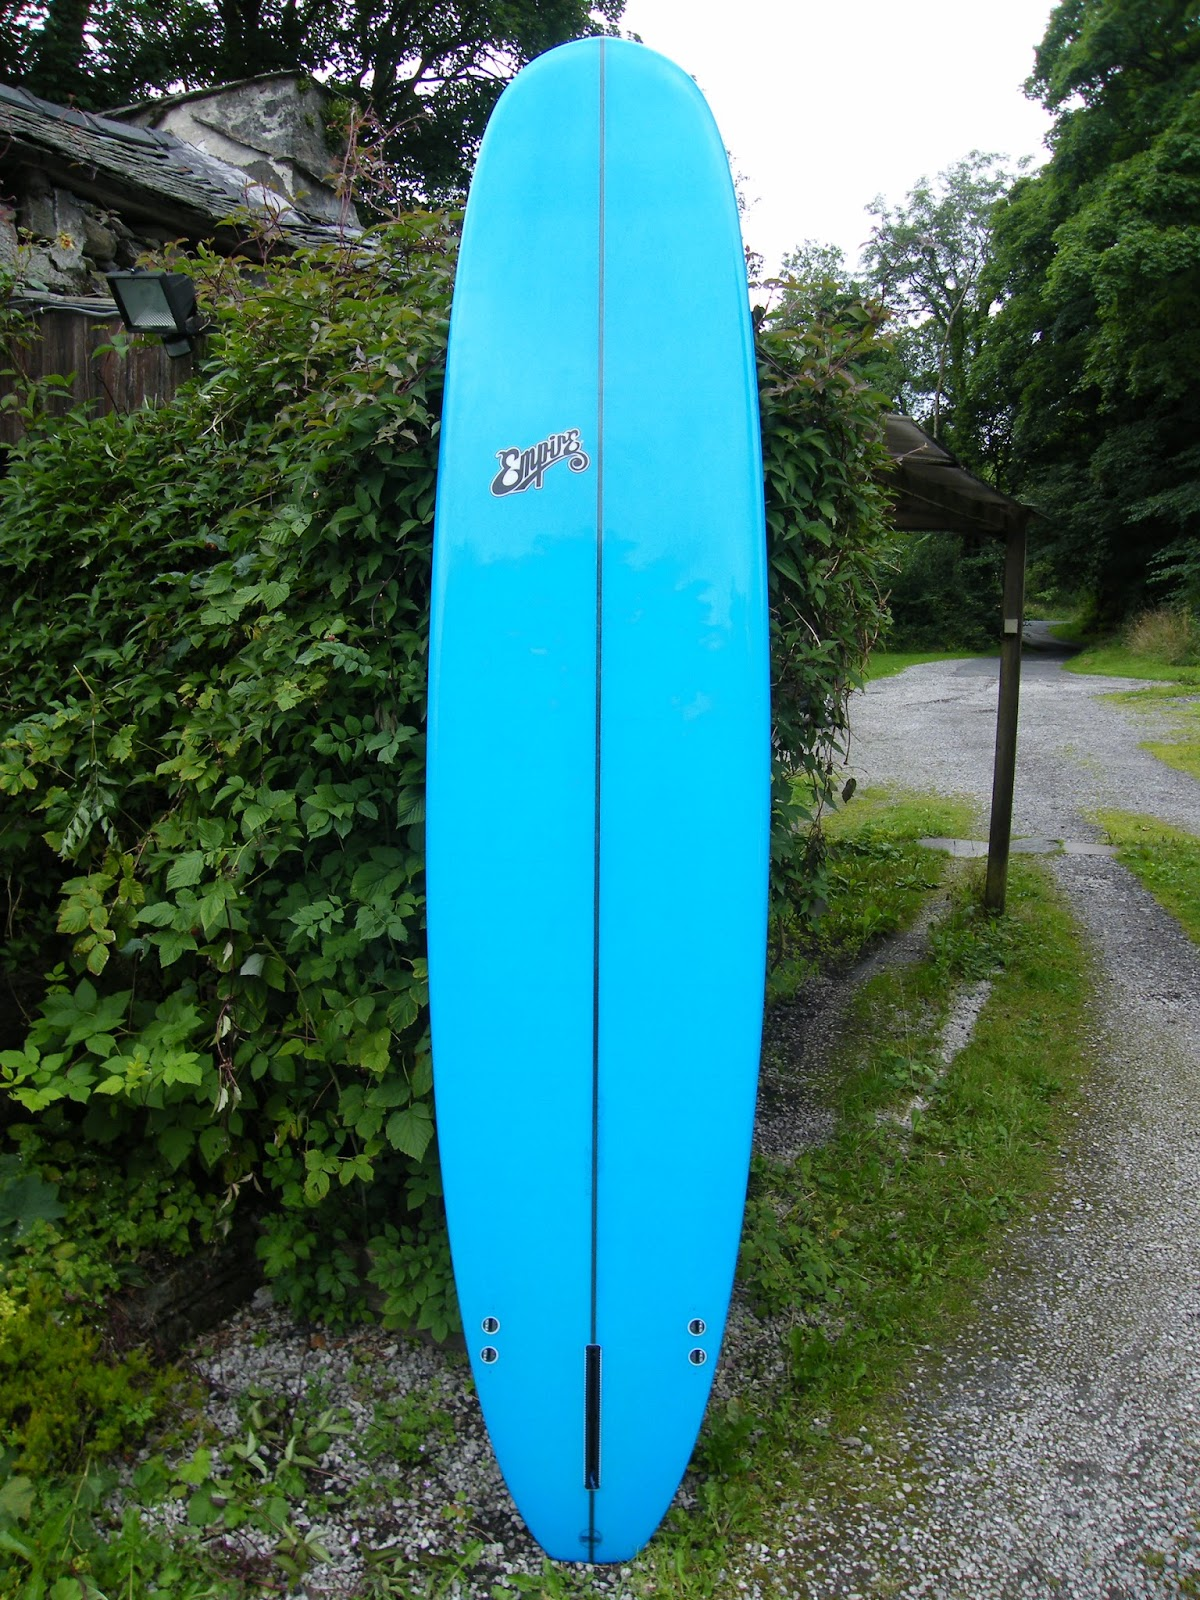 Chris Craft Longboard For Sale